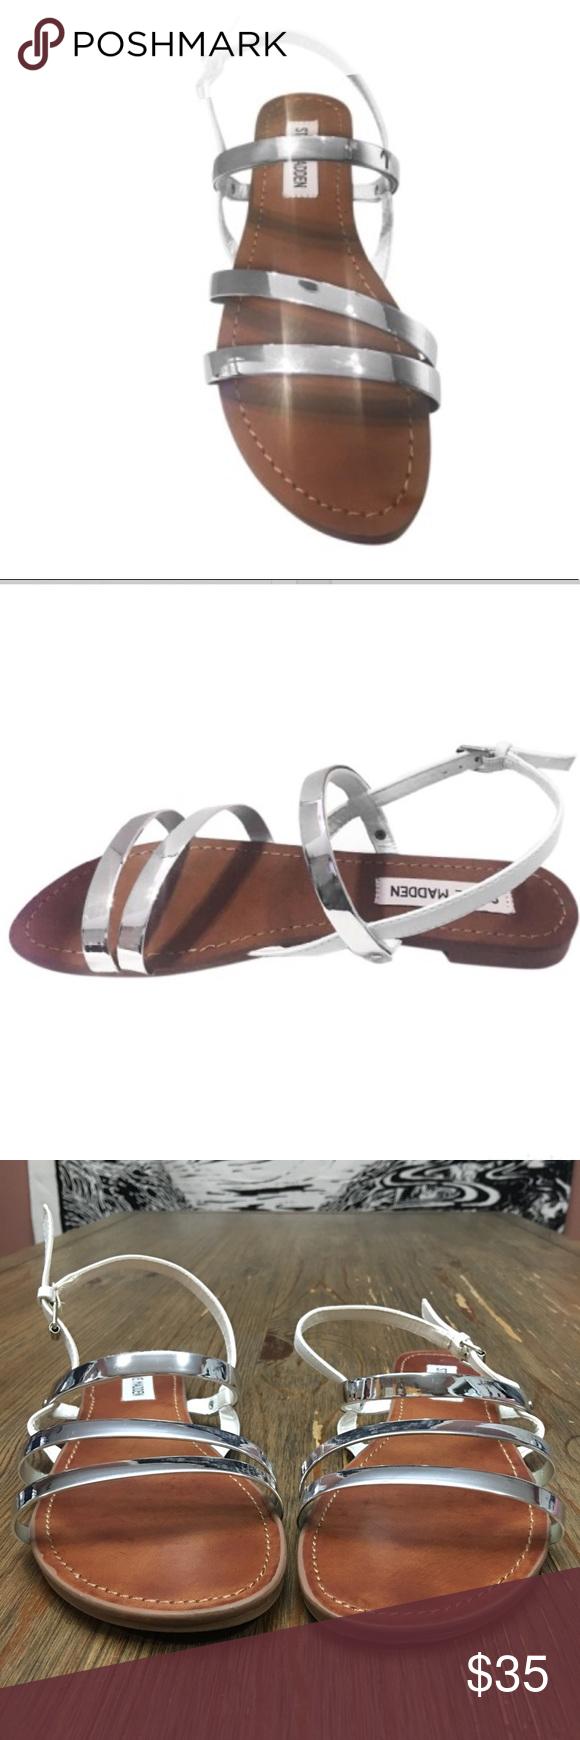 fcd0eebcecb Steve Madden BRIIAA Silver & White Strappy Sandals 🎀Steve Madden ...